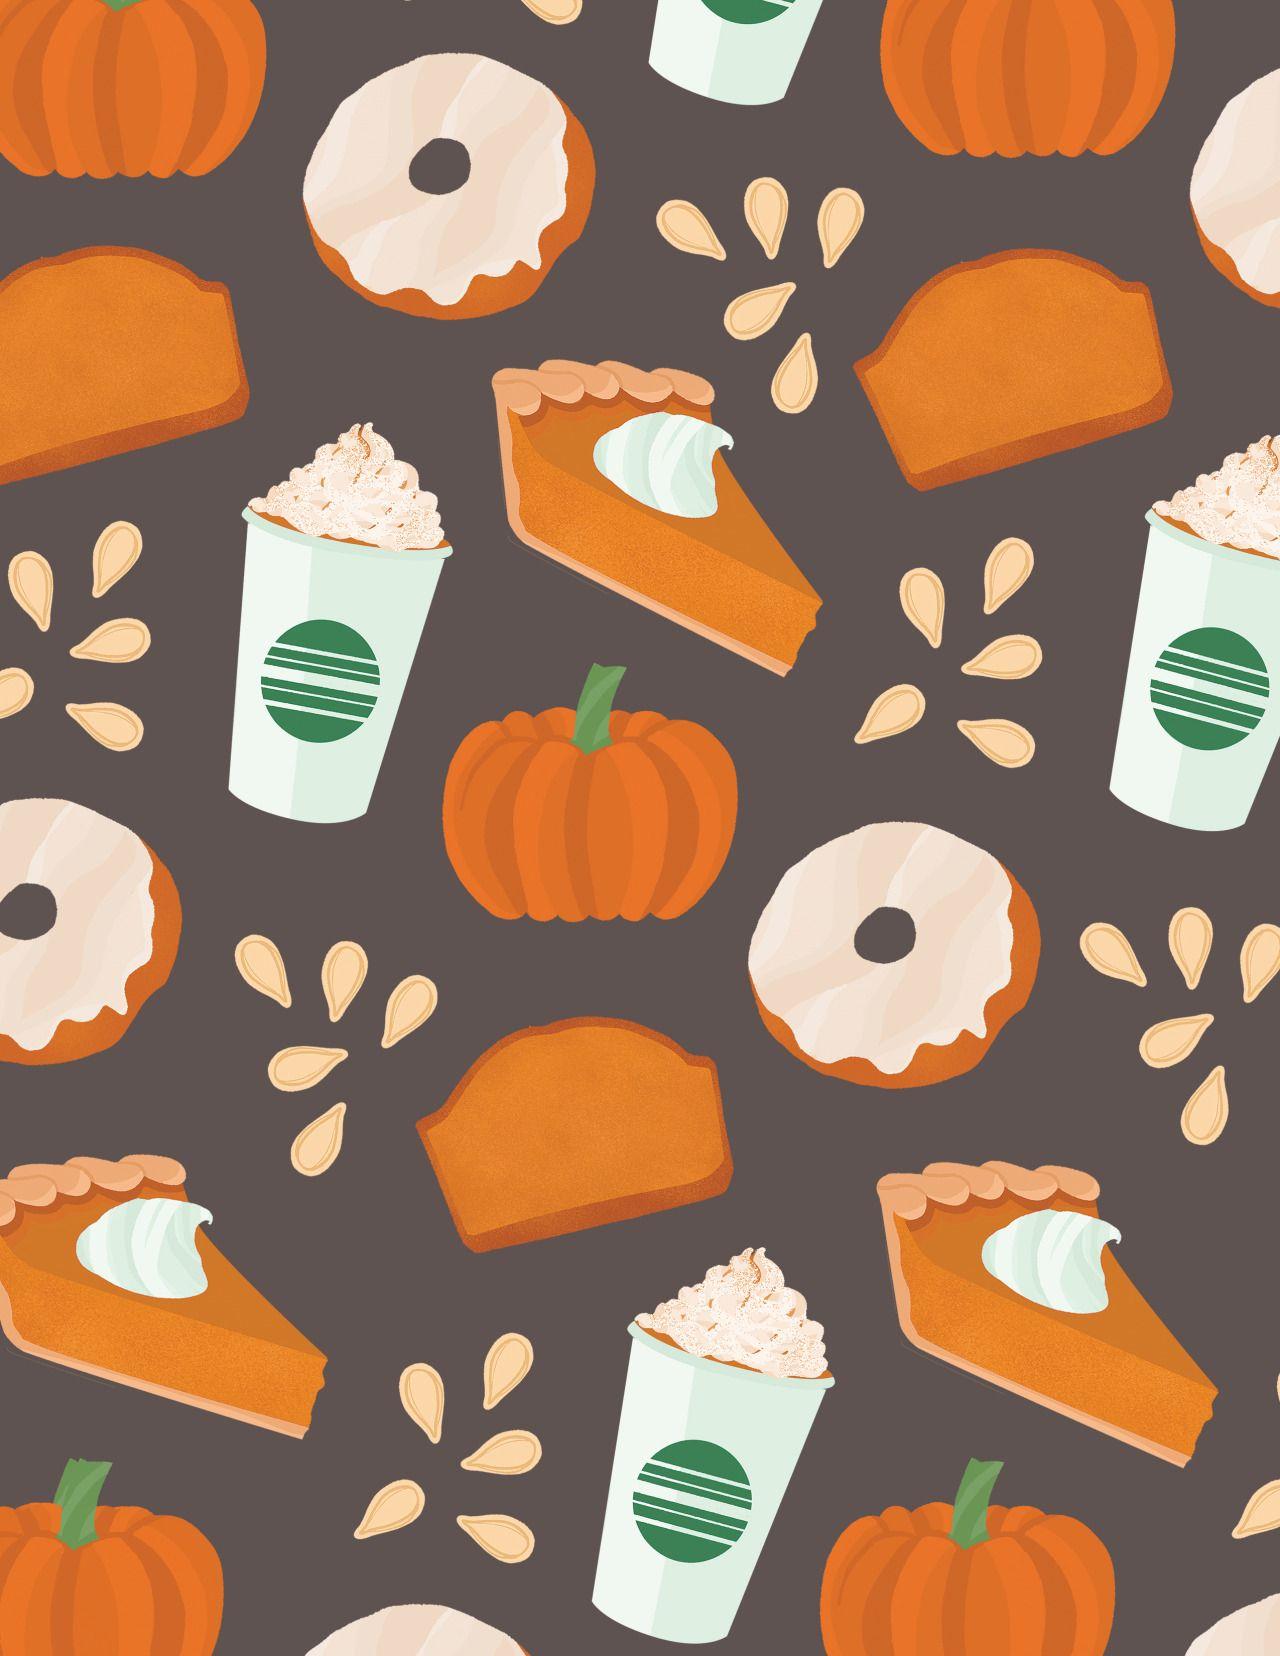 Celebrate Halloween Every Day Autumn'16 Pinterest